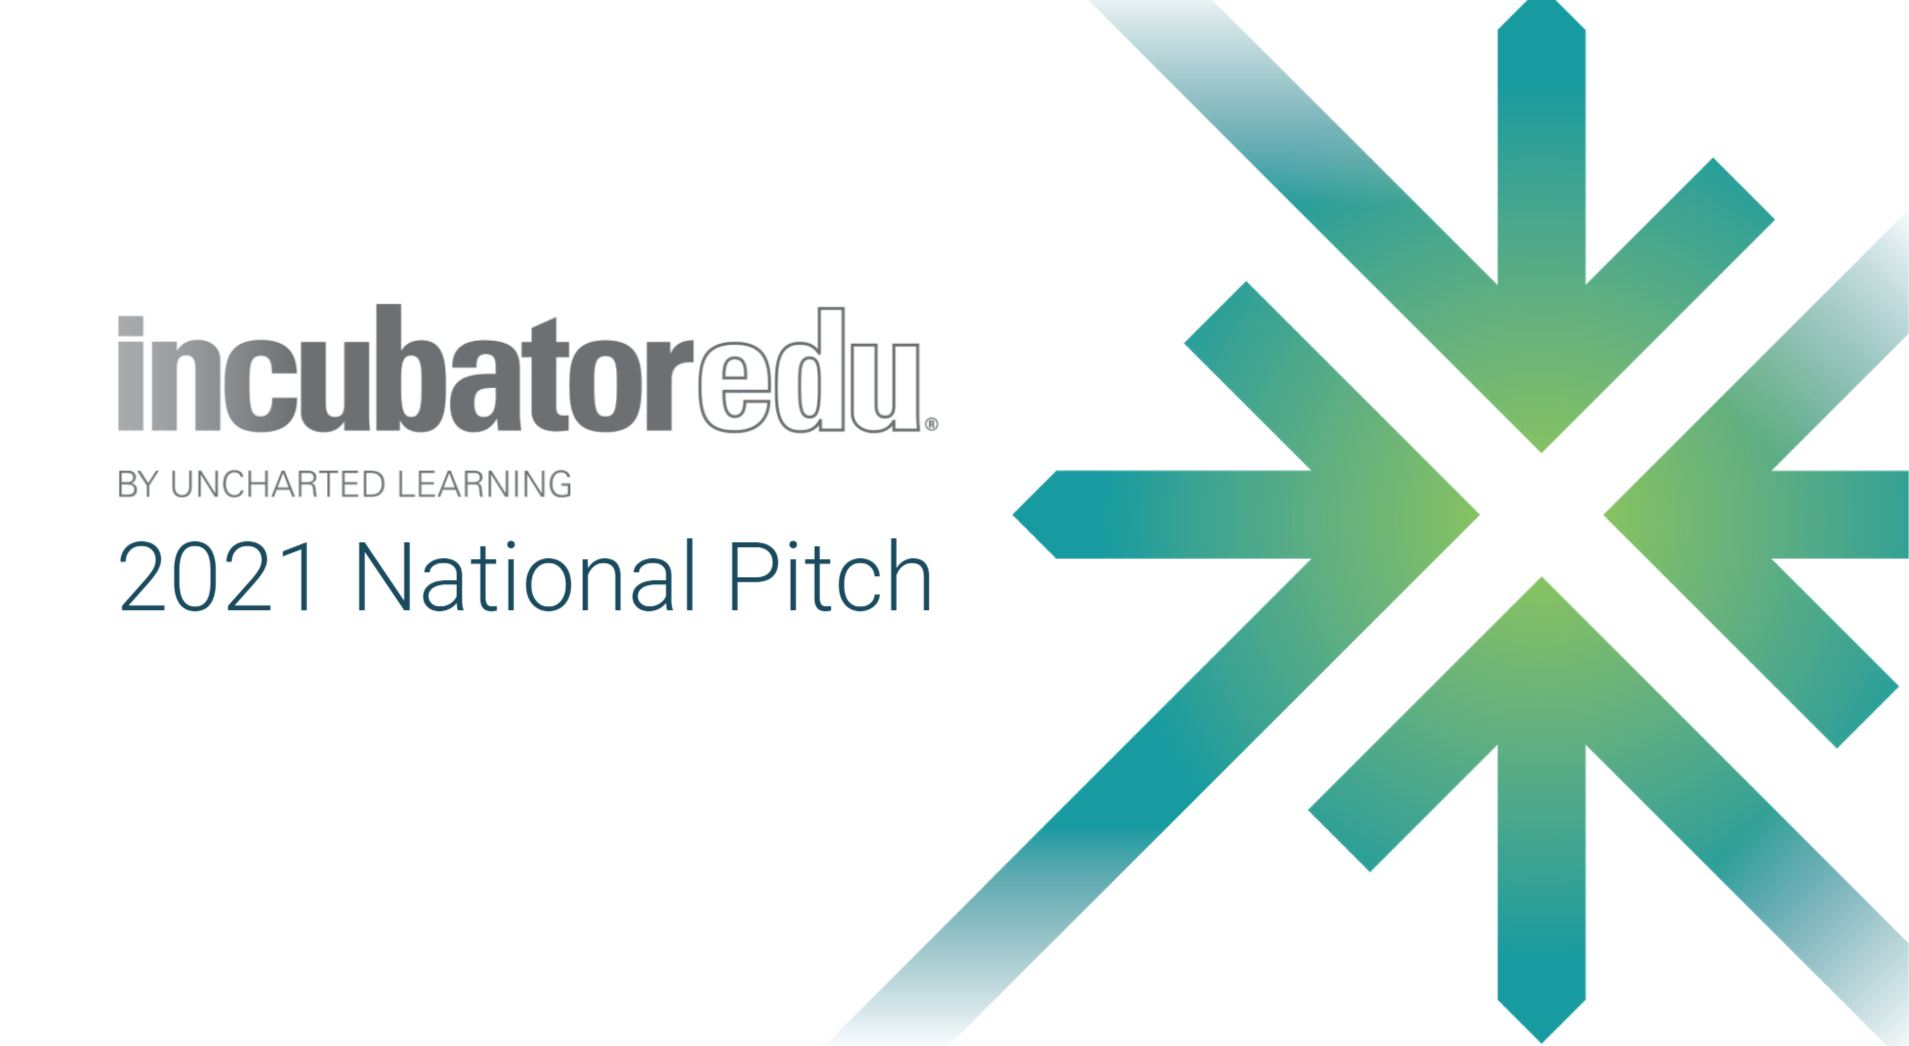 2021 INCubatoredu National Student Pitch